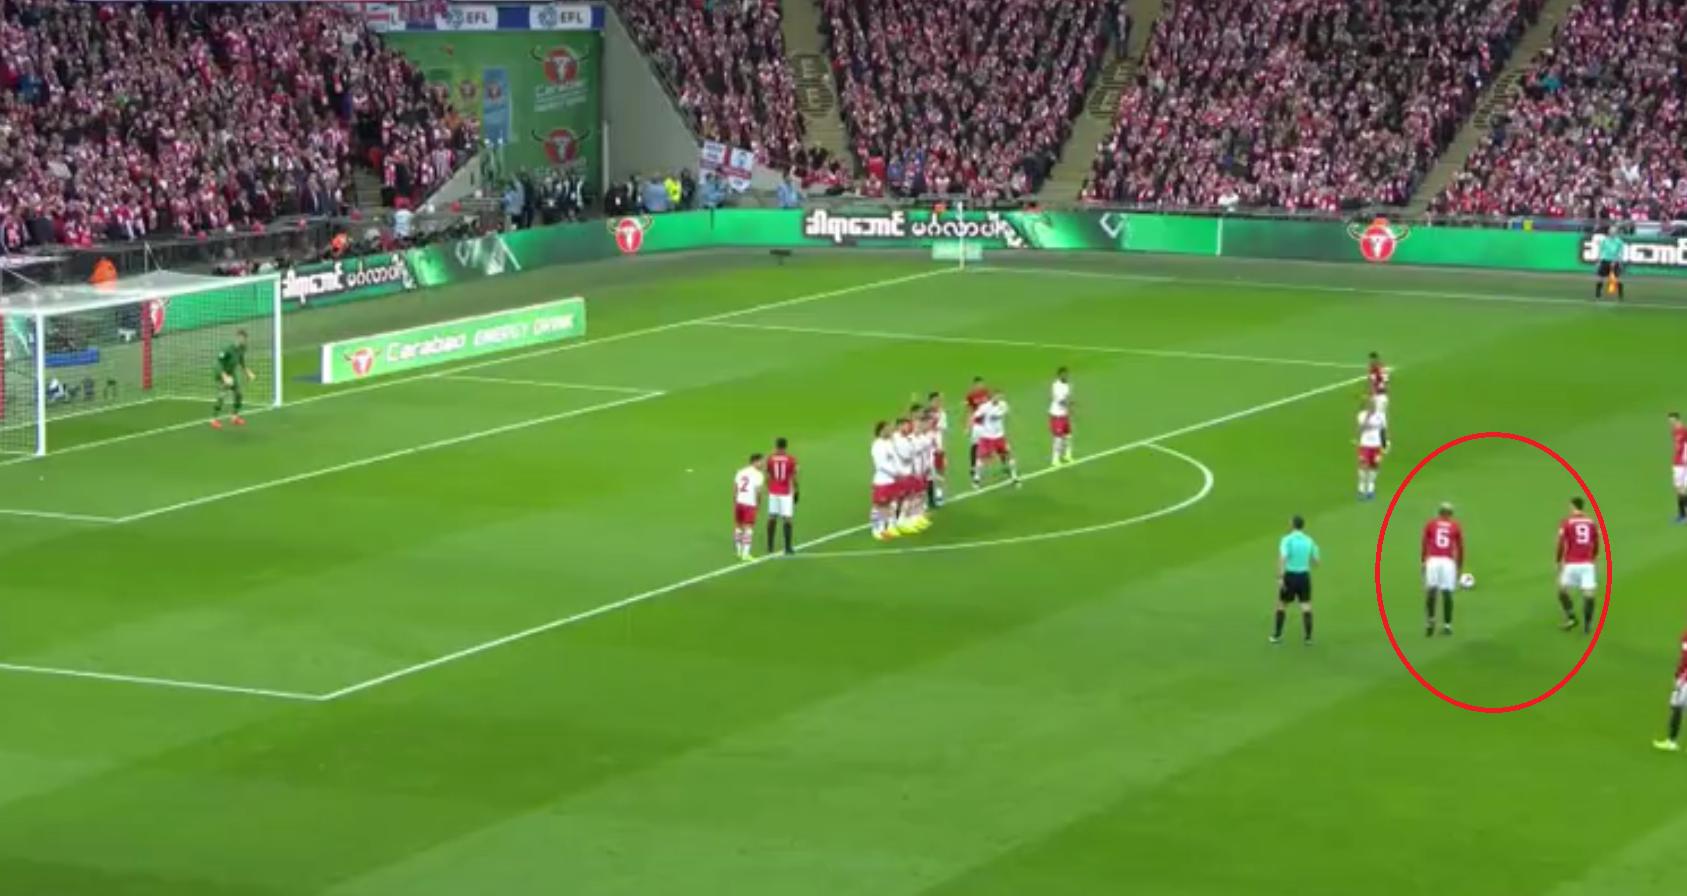 Football - Etranger - Le coup franc splendide d'Ibrahimovic contre Southampton en vidéo